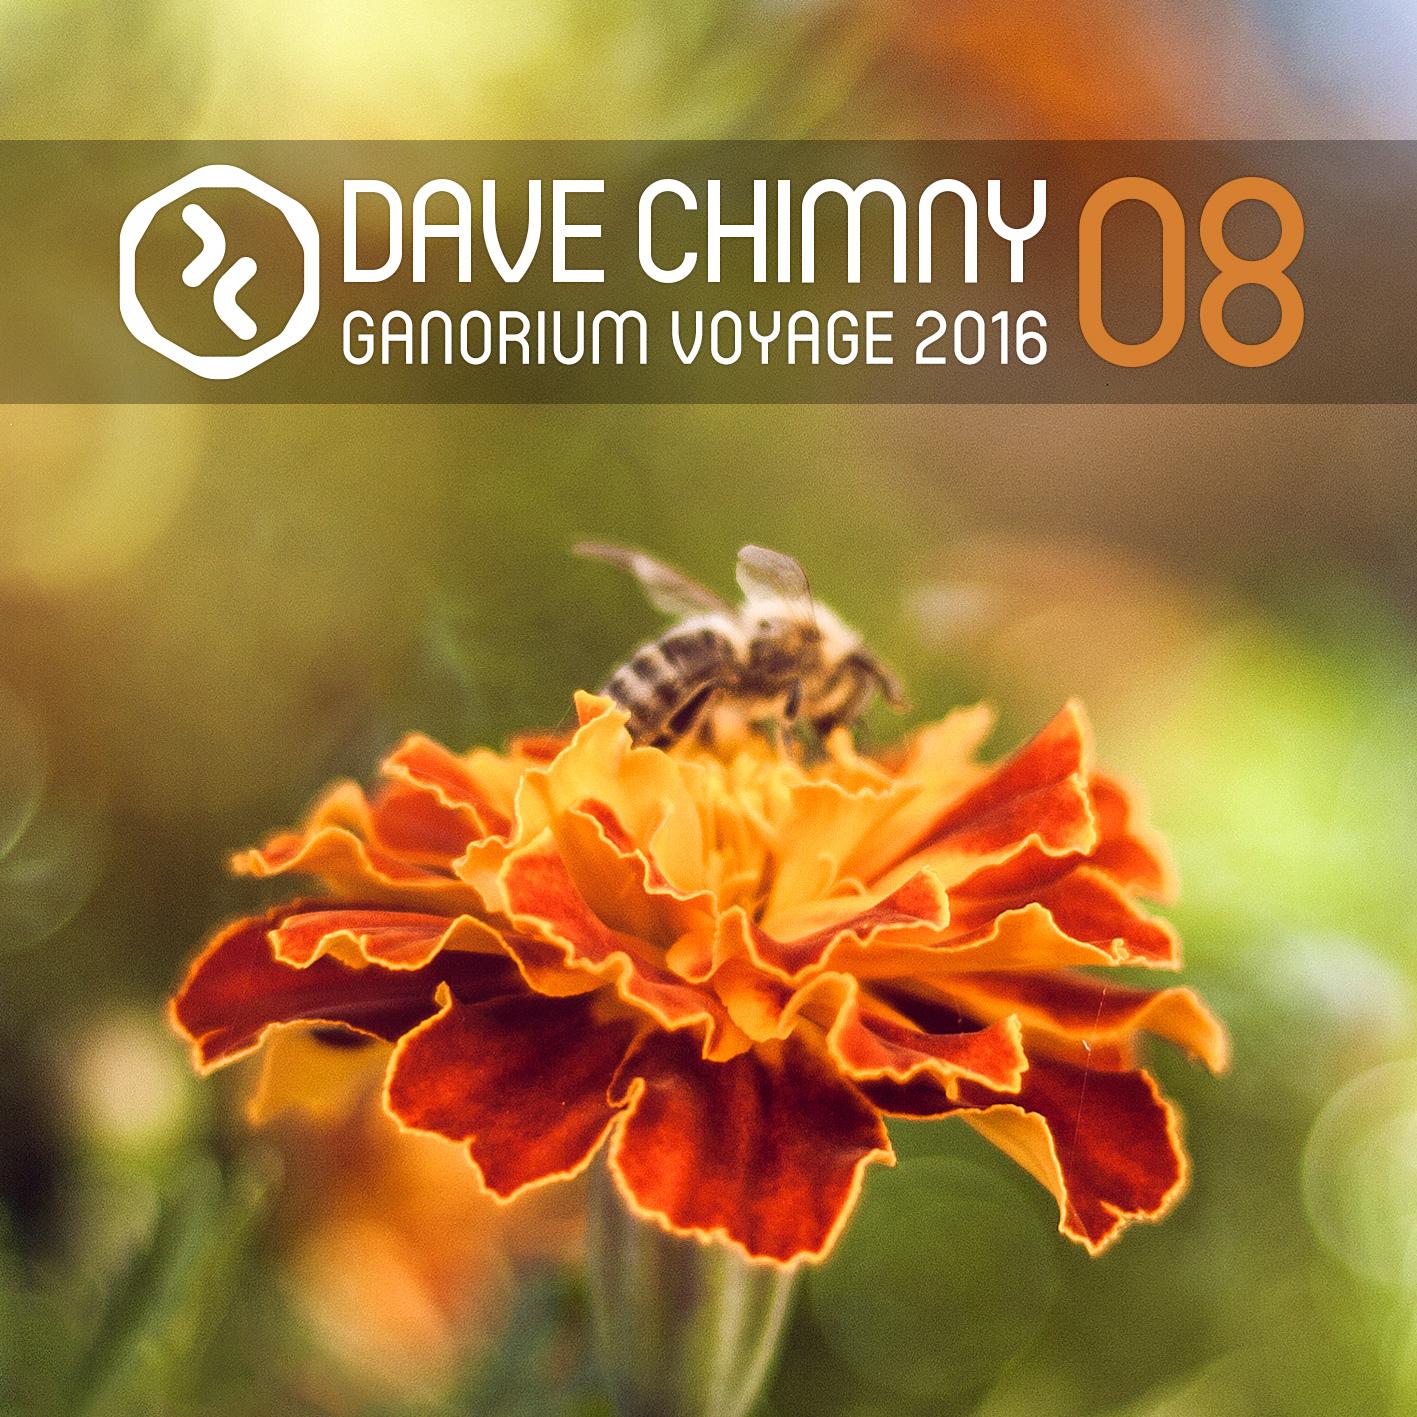 Dave Chimny – Ganorium Voyage 2016-08